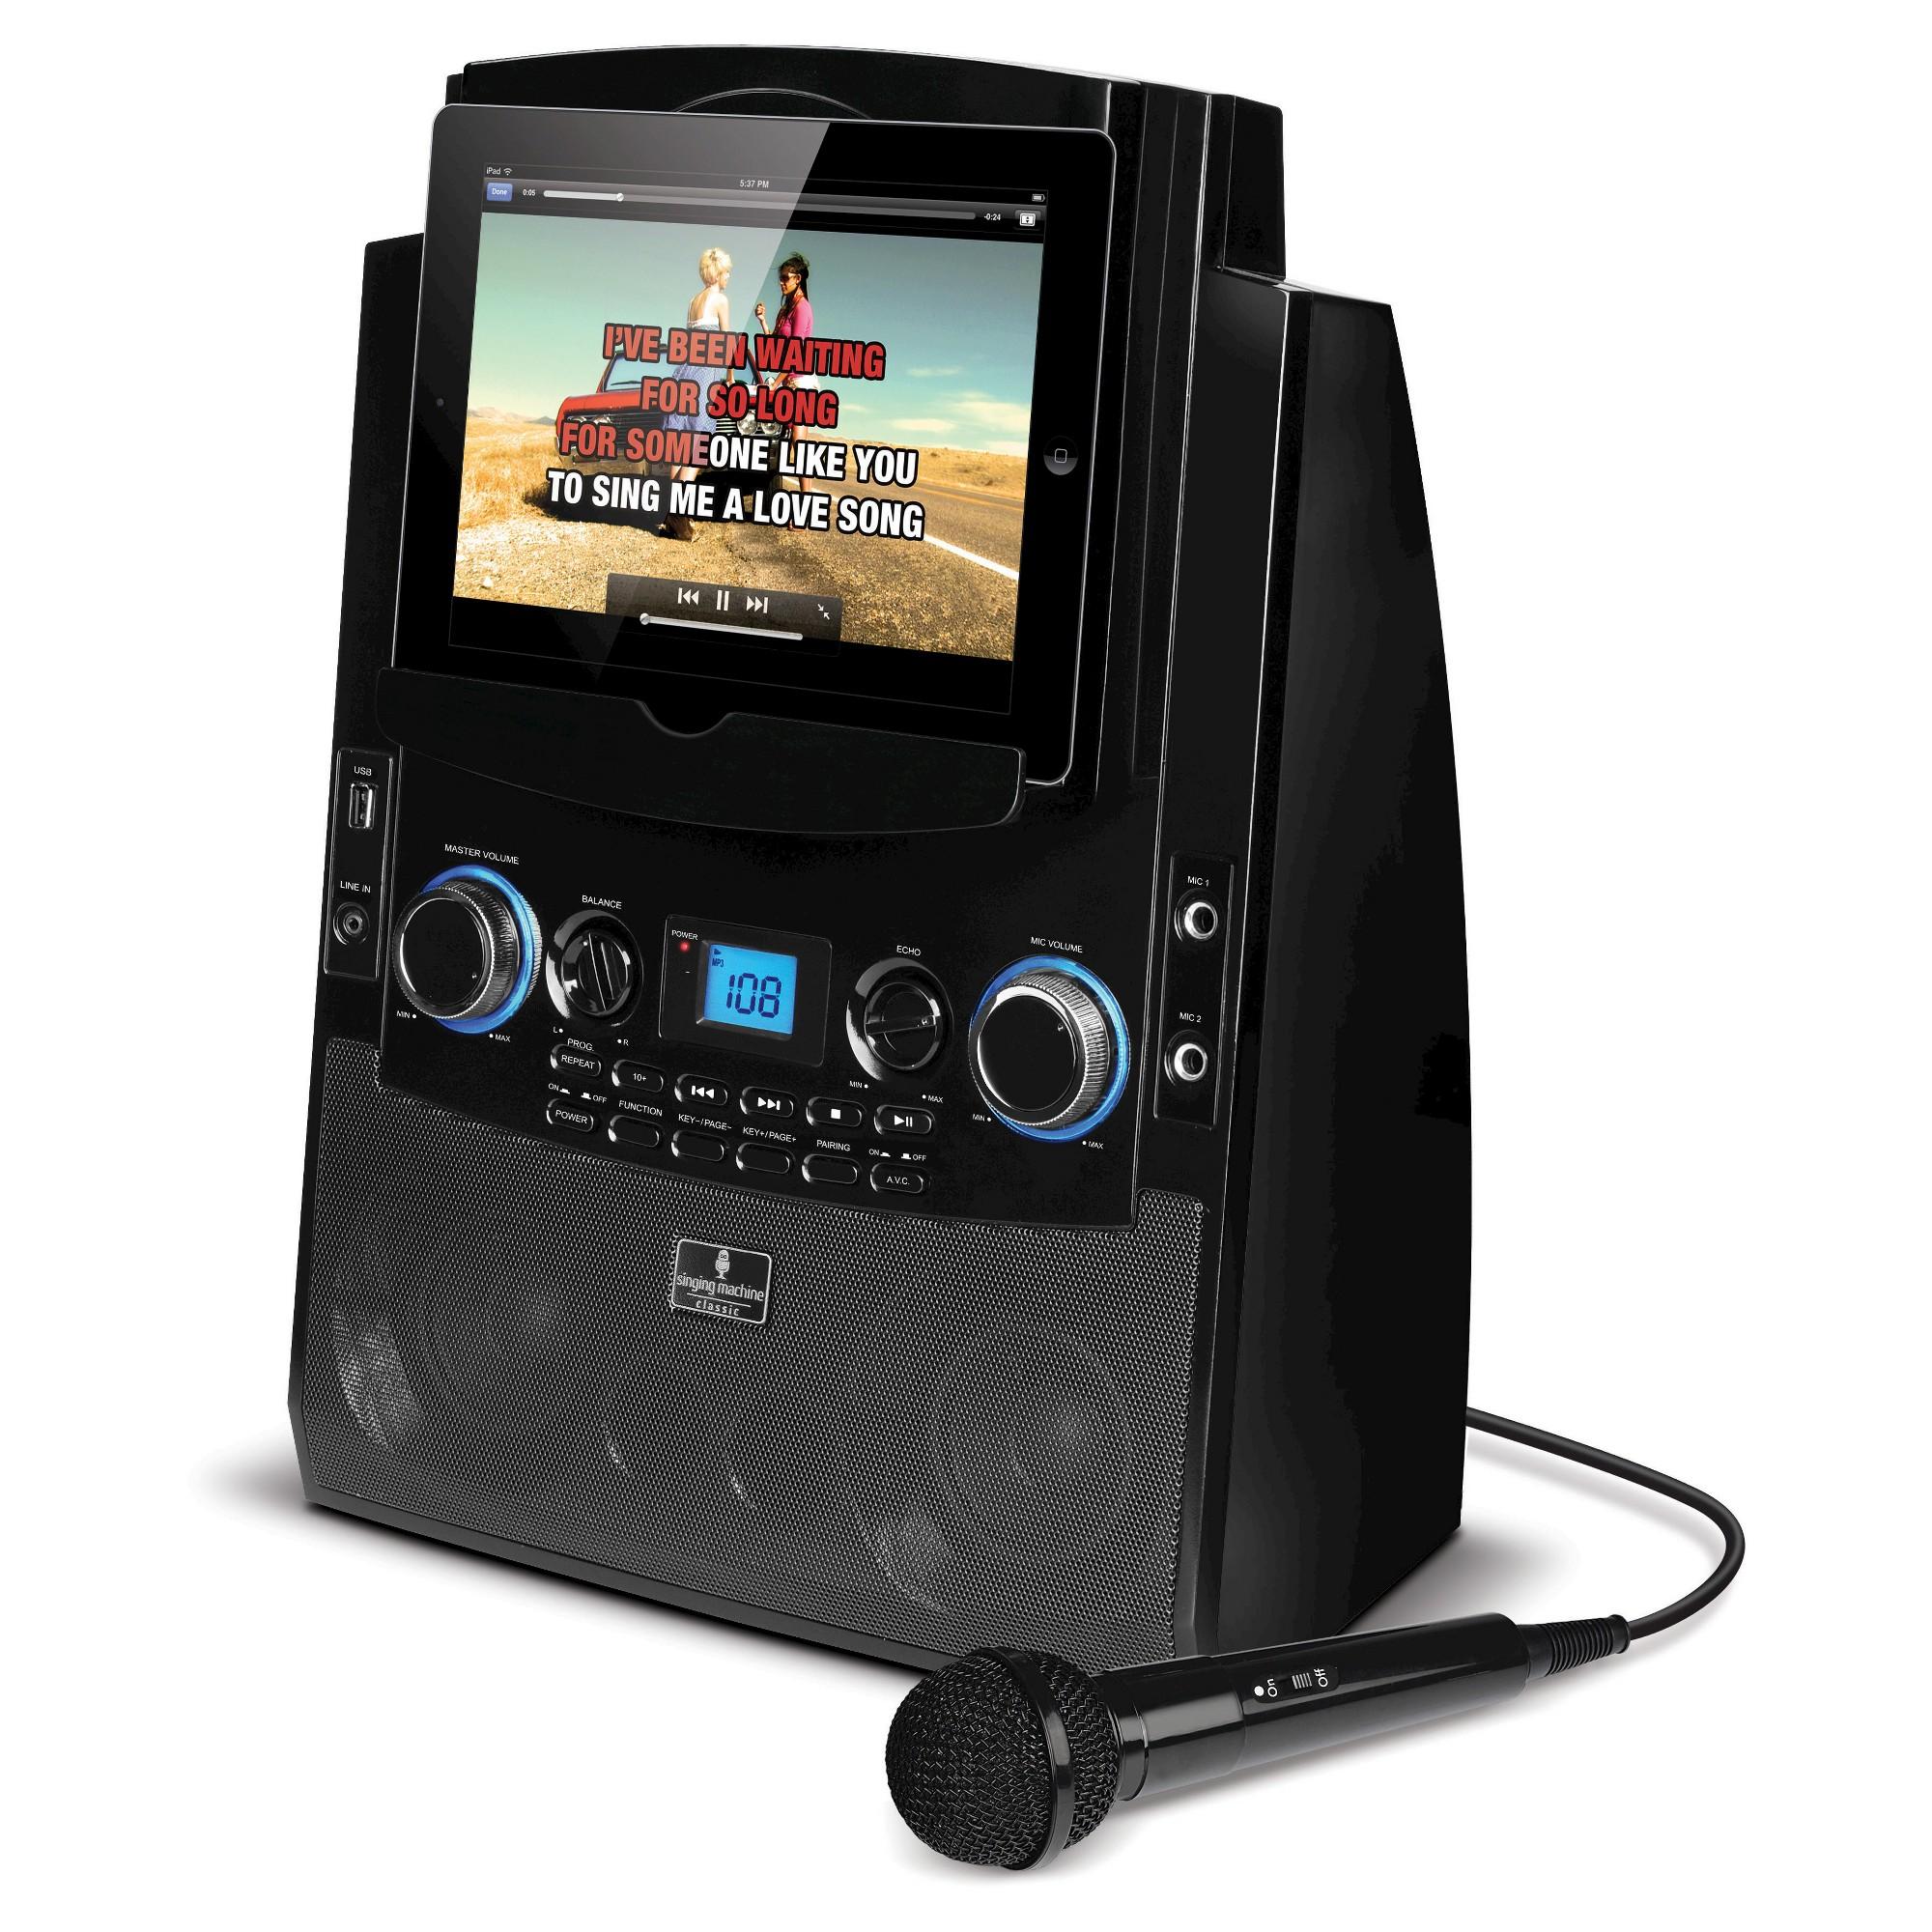 The Singing Machine Bluetooth Karaoke System for iPad